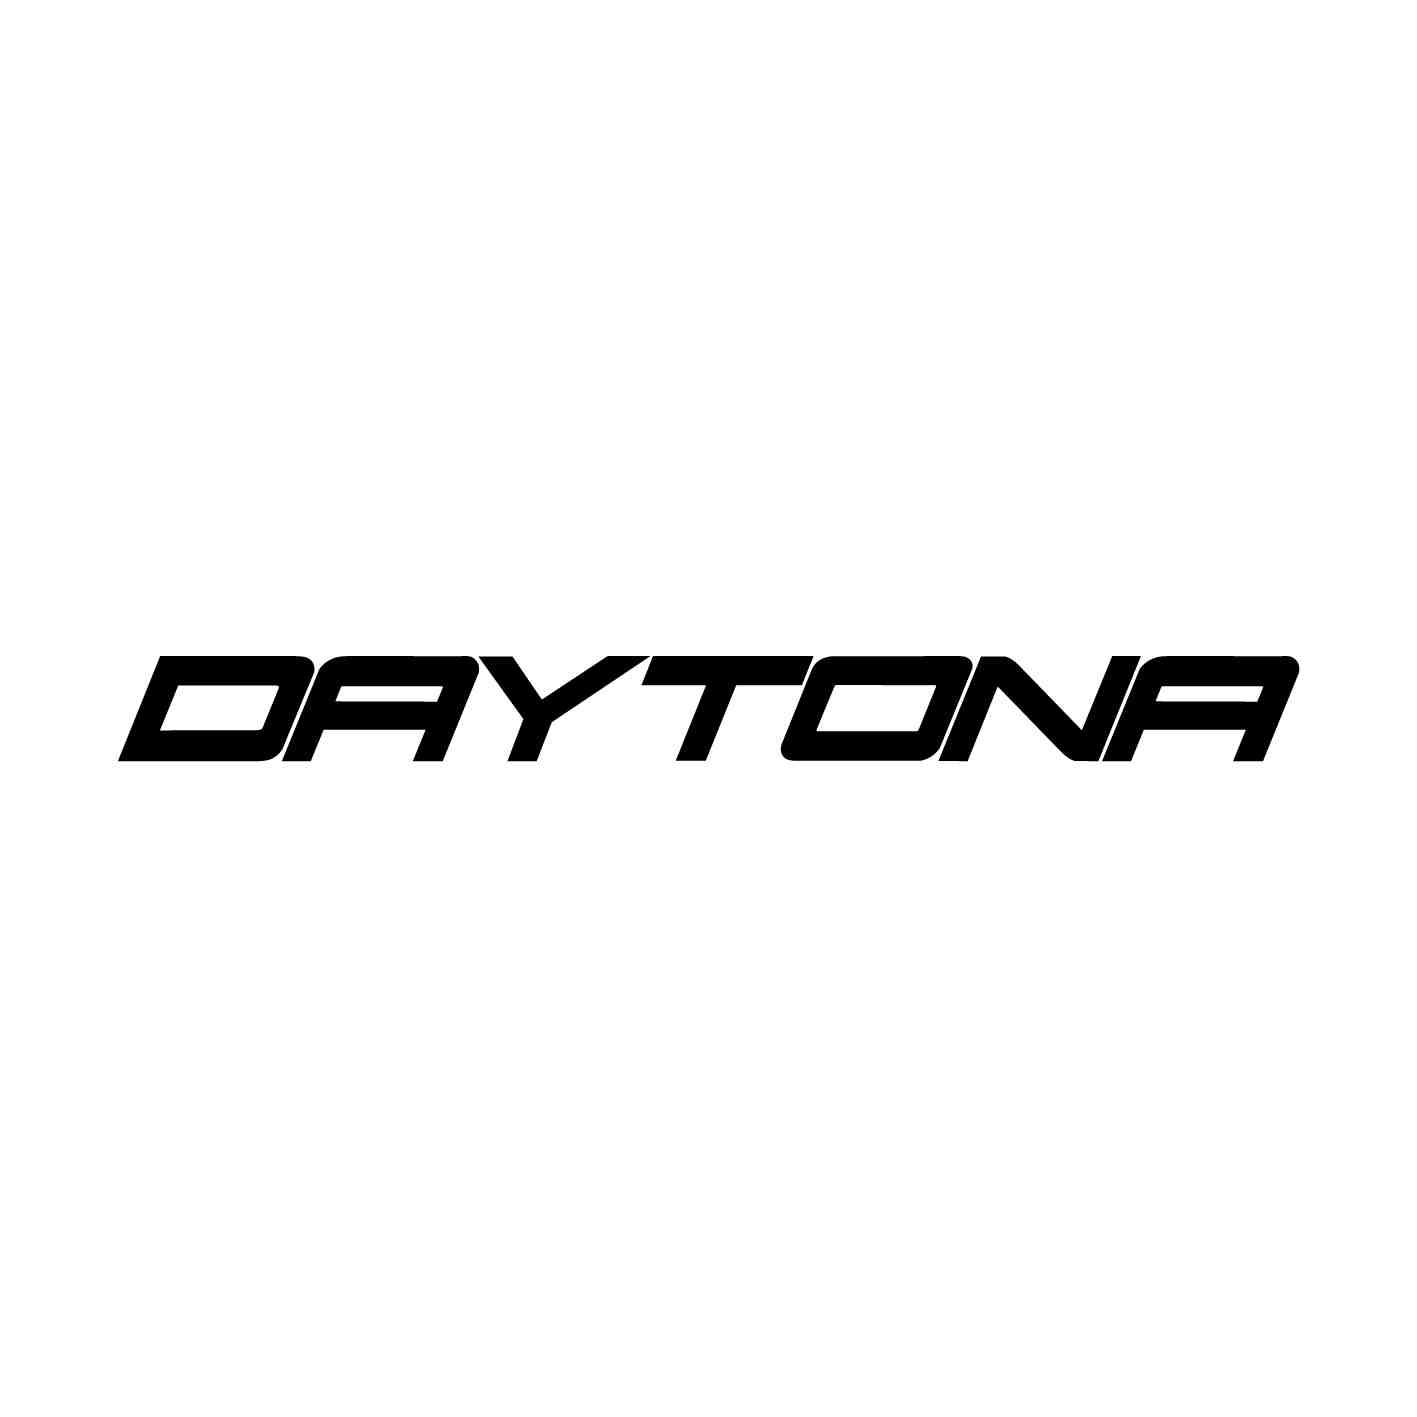 triumph-ref6-daytona-stickers-moto-casque-scooter-sticker-autocollant-adhesifs